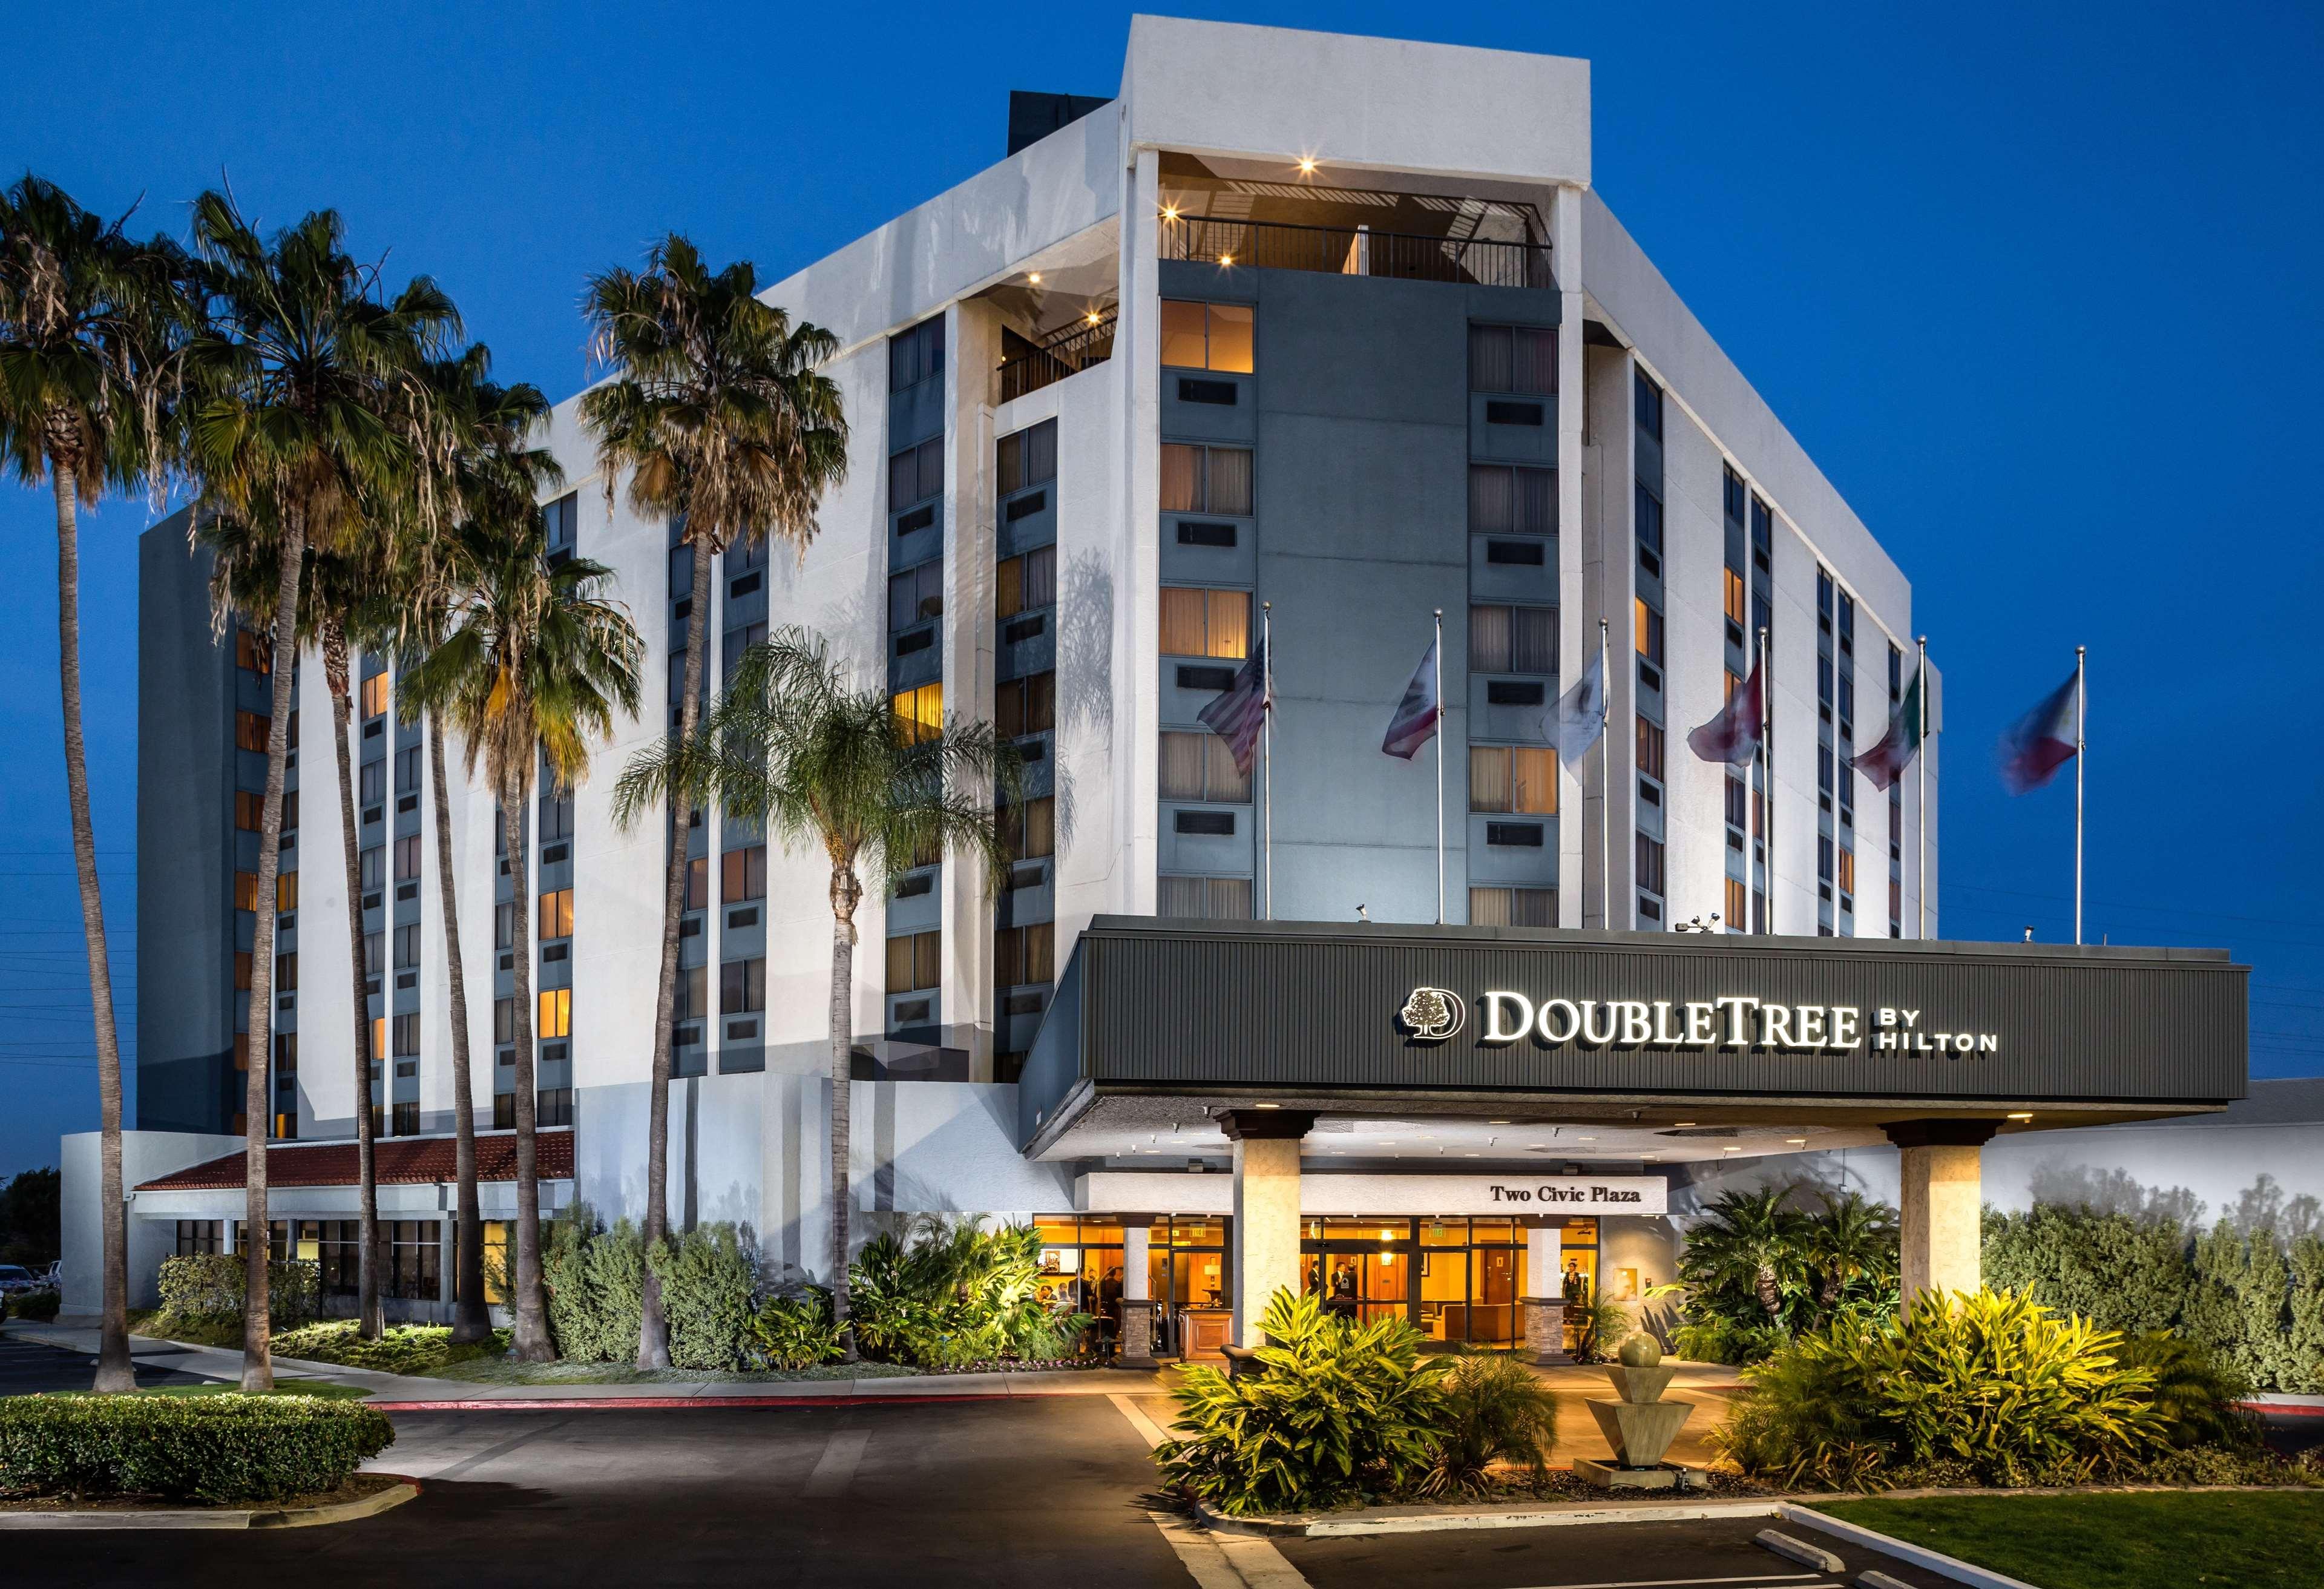 Doubletree By Hilton Hotel Carson Carson California Ca